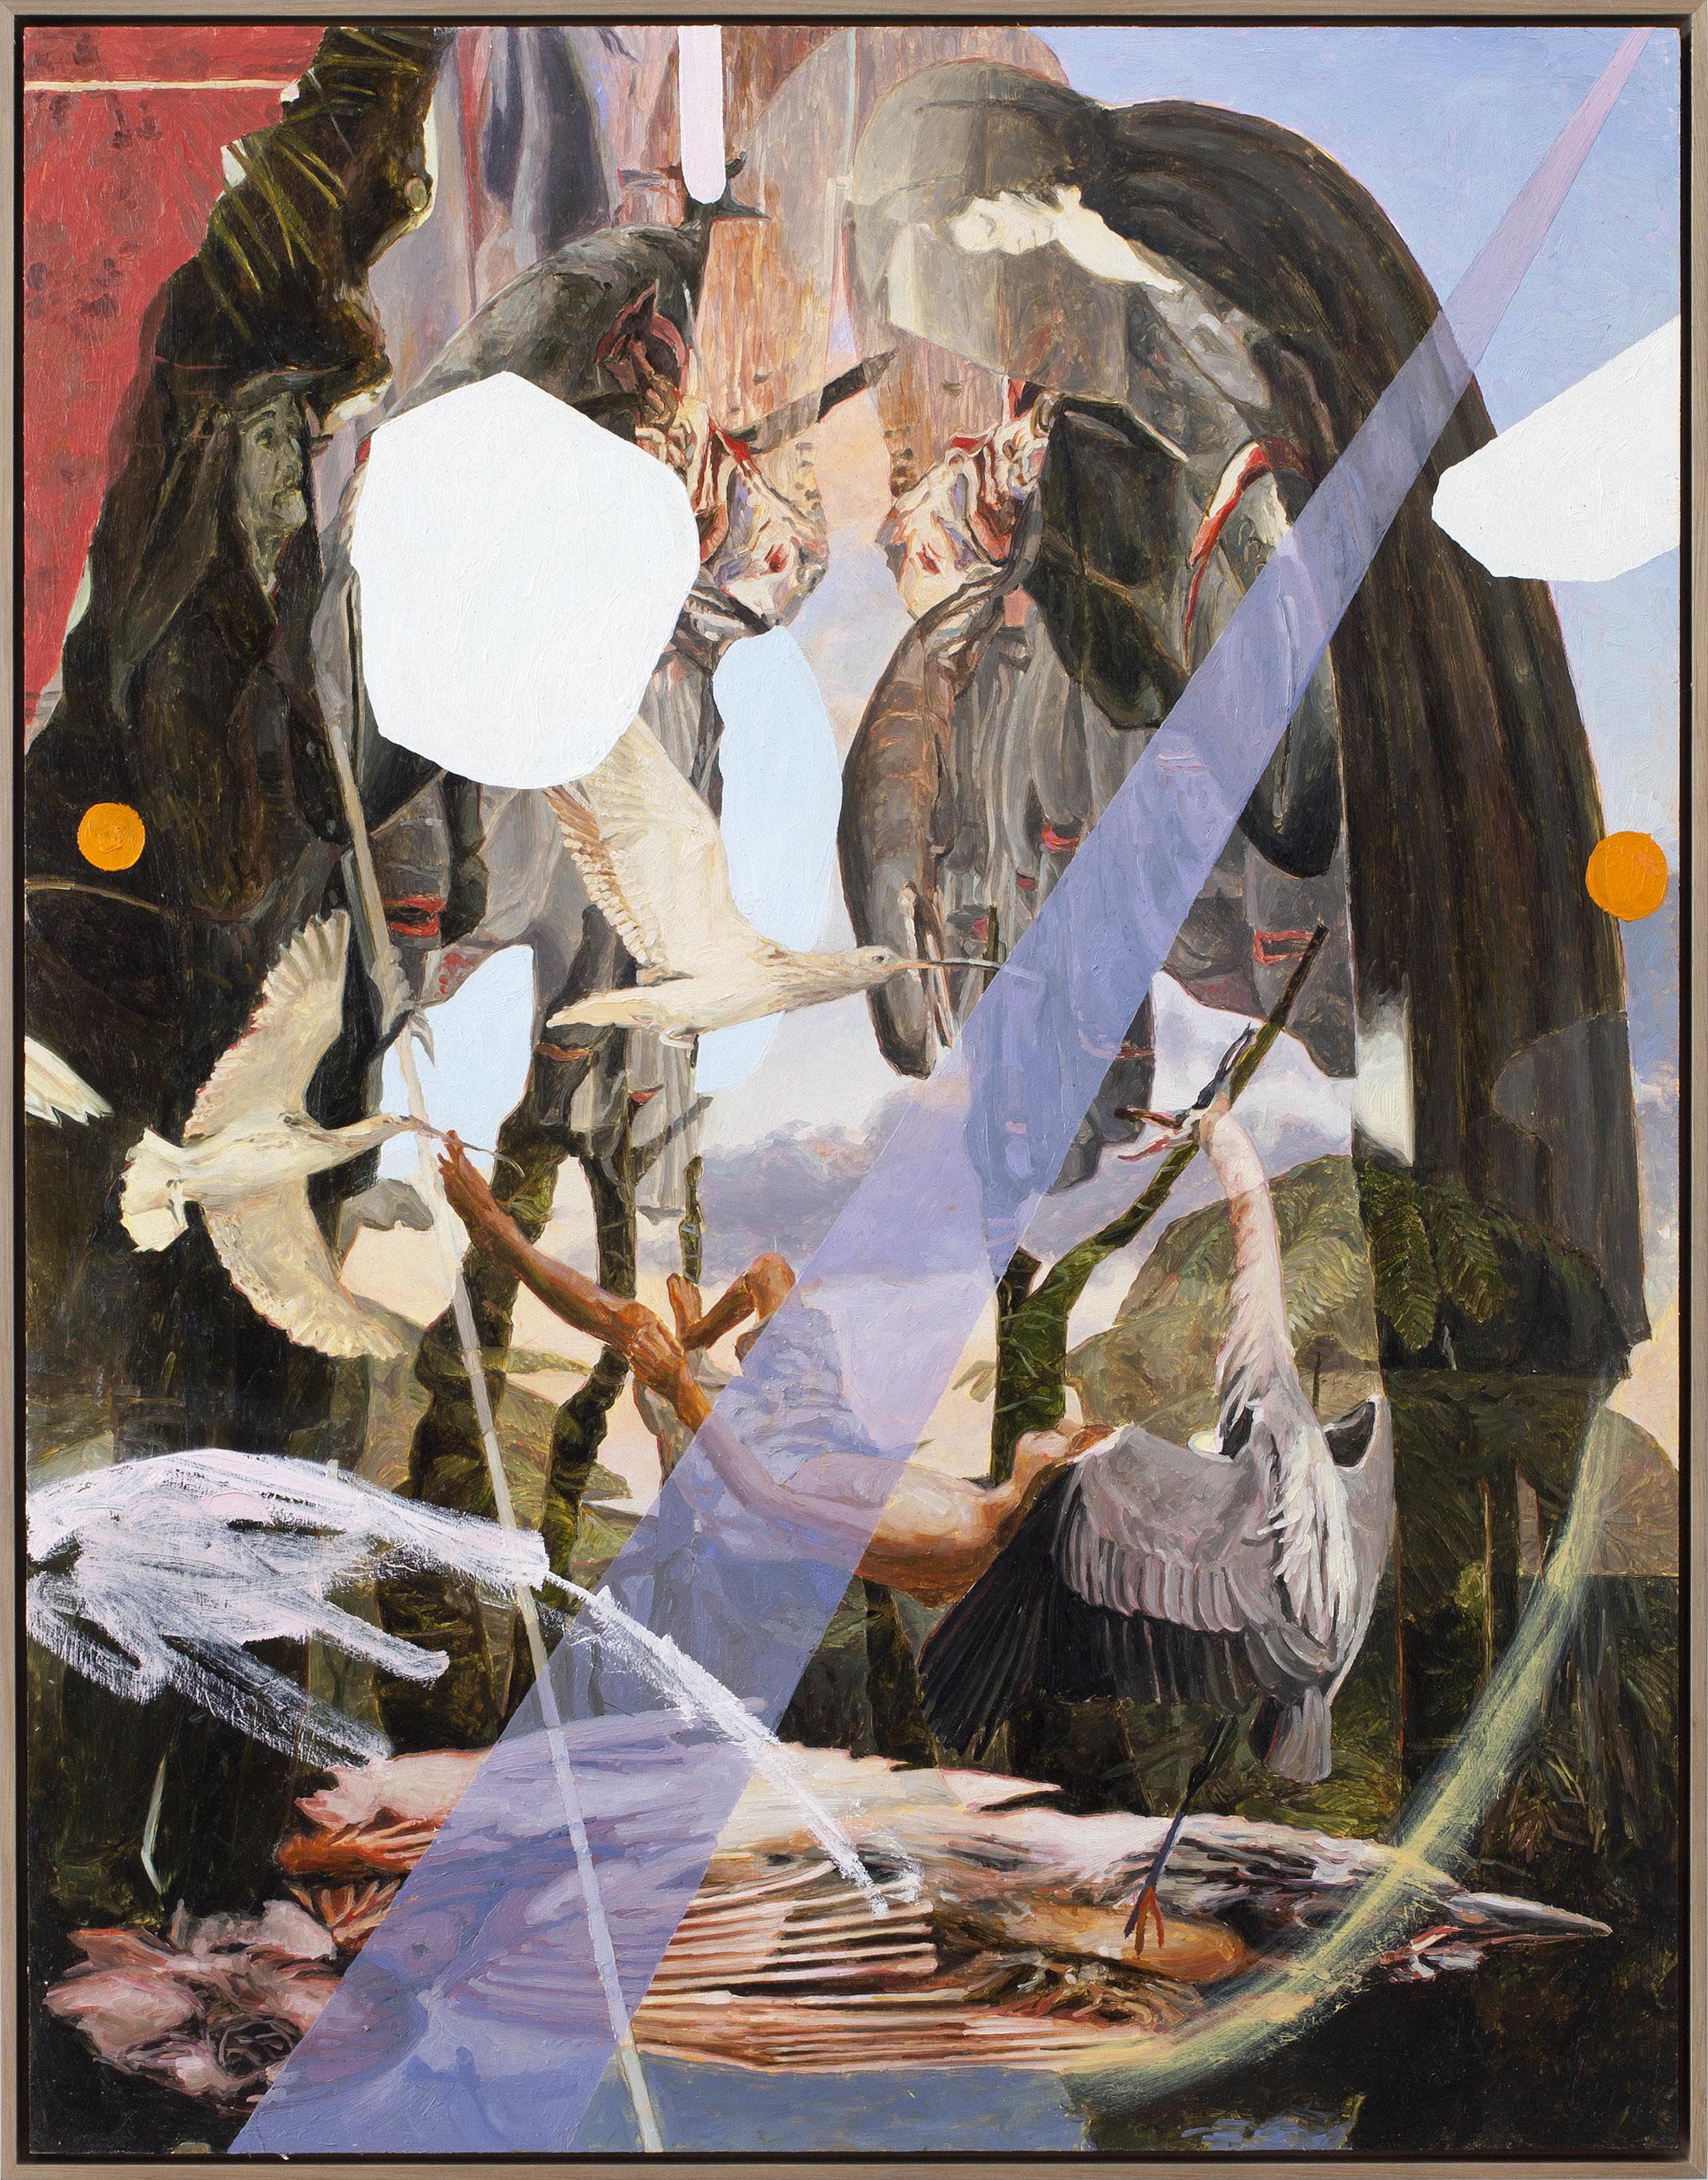 Featherbed (Antonio), oil on board 90 x 70 cm, 2015. (Private collection).